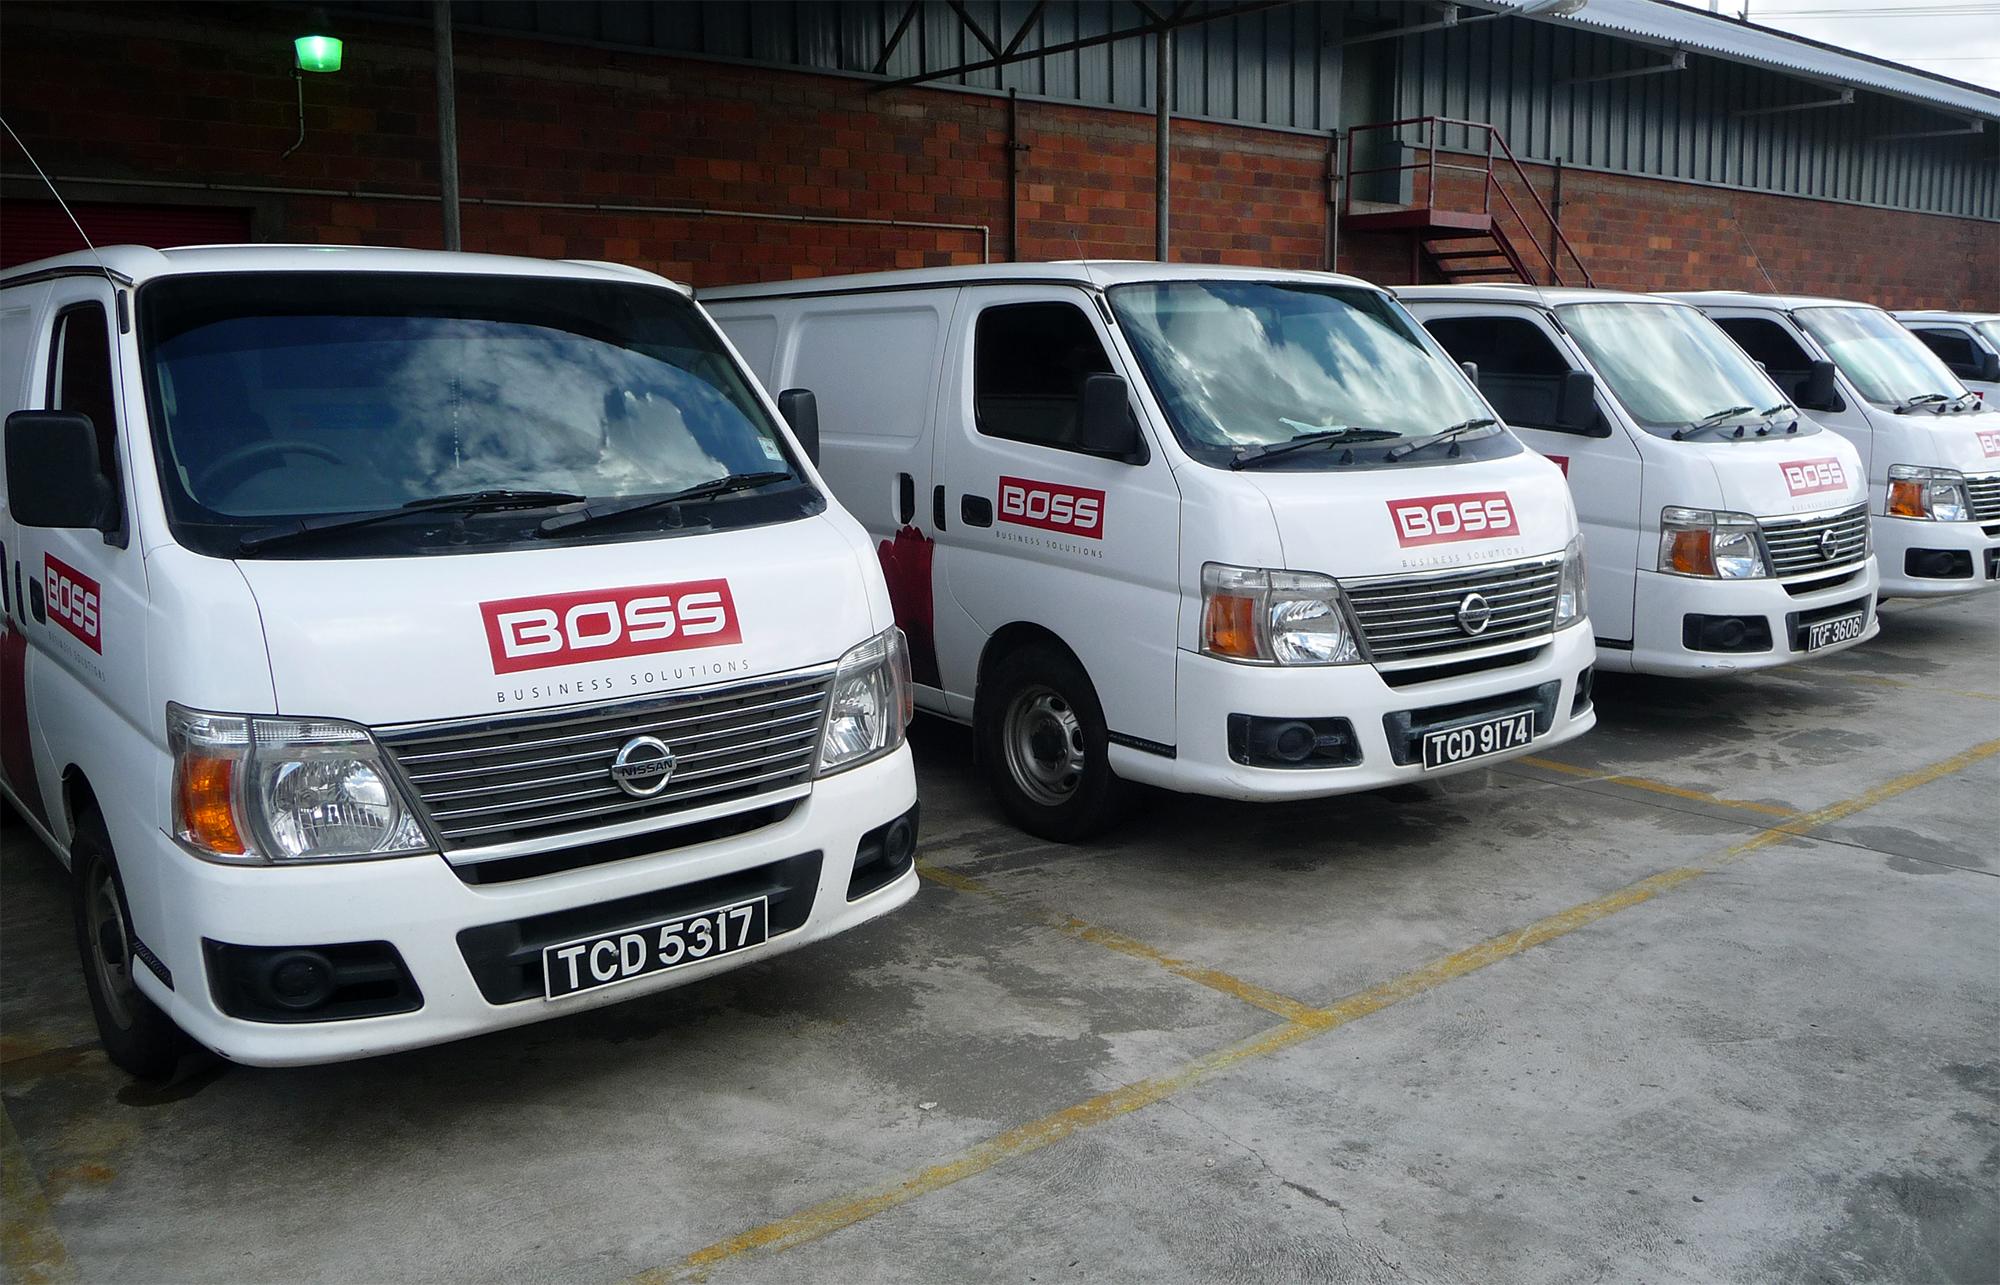 Boss (Trucks)